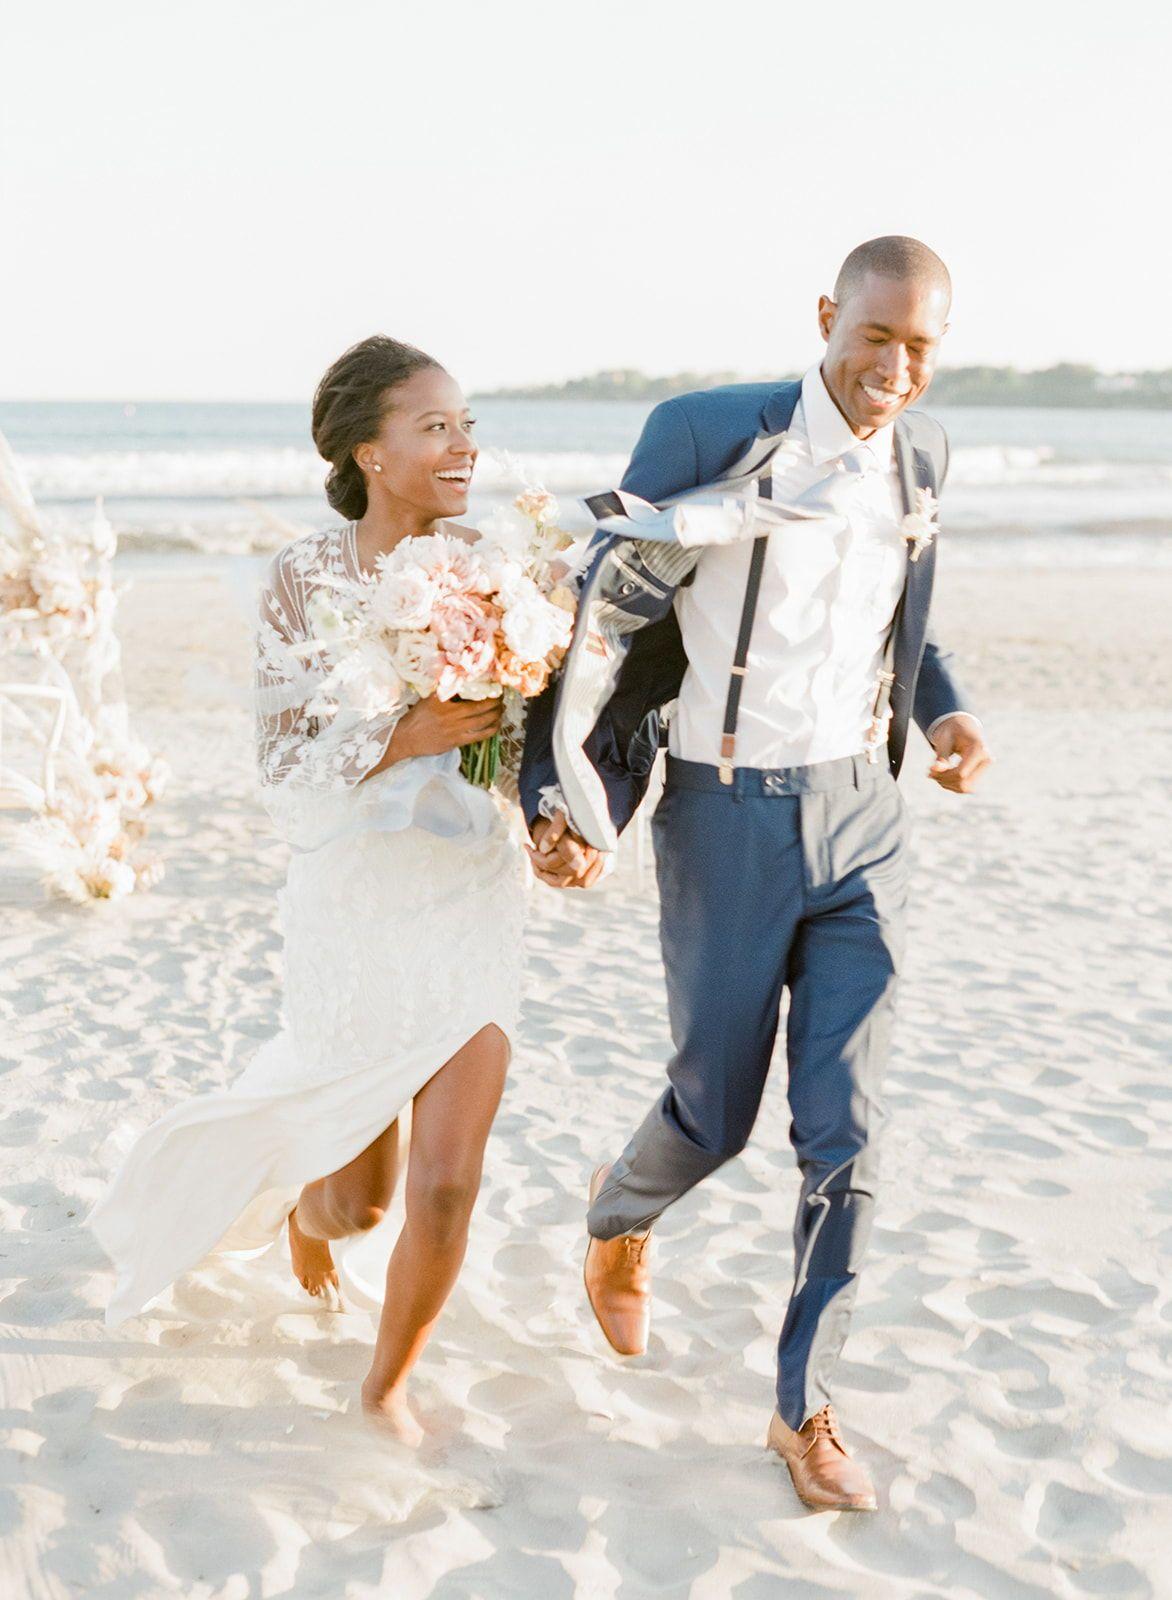 Newport Ri Wedding Location On Beach